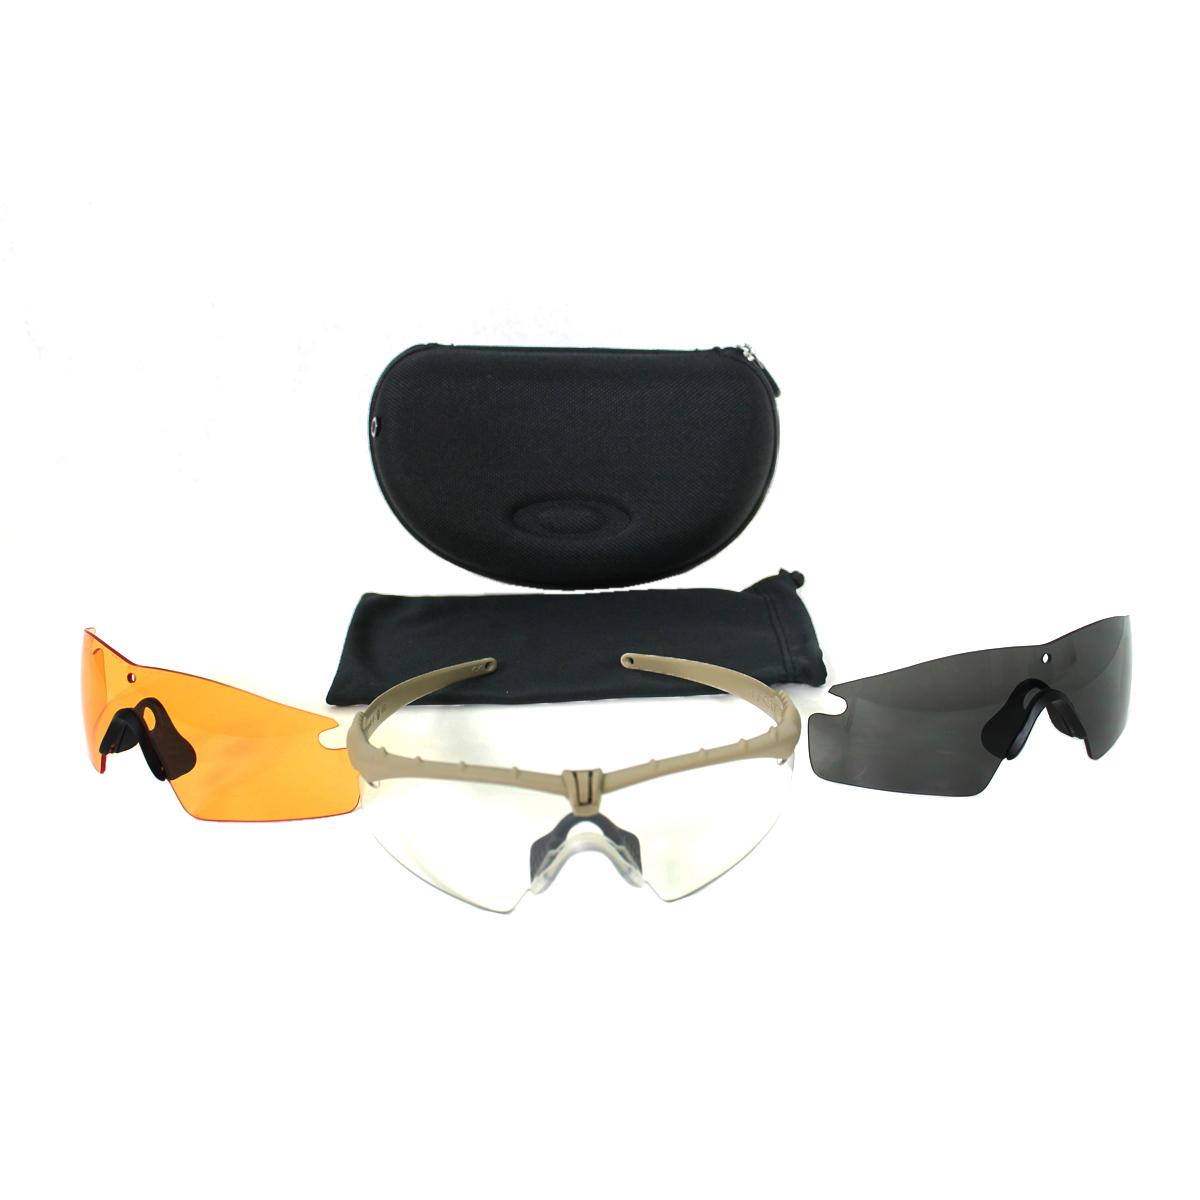 Oakley M Frame Helo Kit Ebay | Louisiana Bucket Brigade